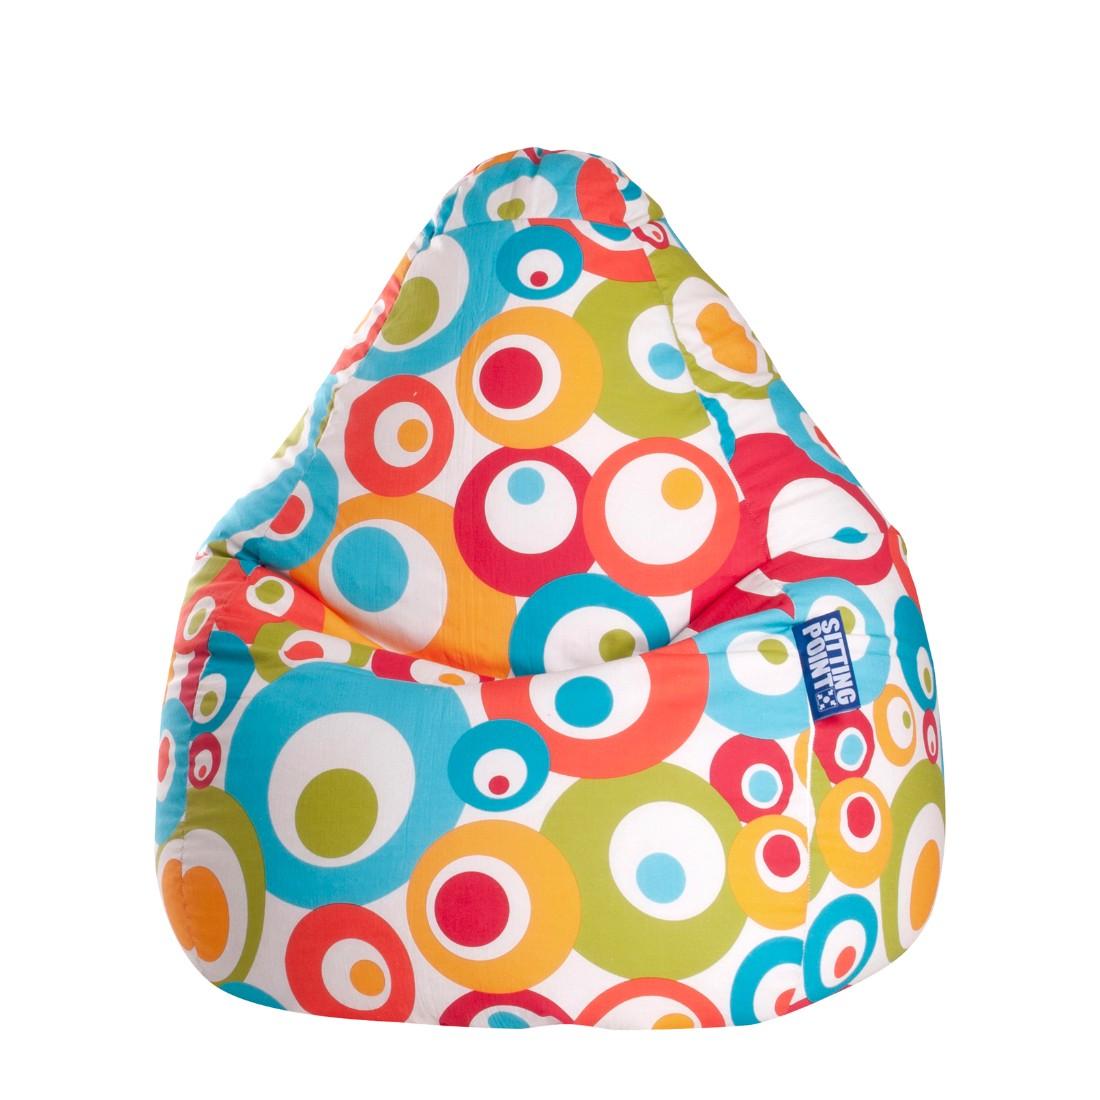 Home 24 - Pouf poire malibu xl - coton - multicolore, sitting point